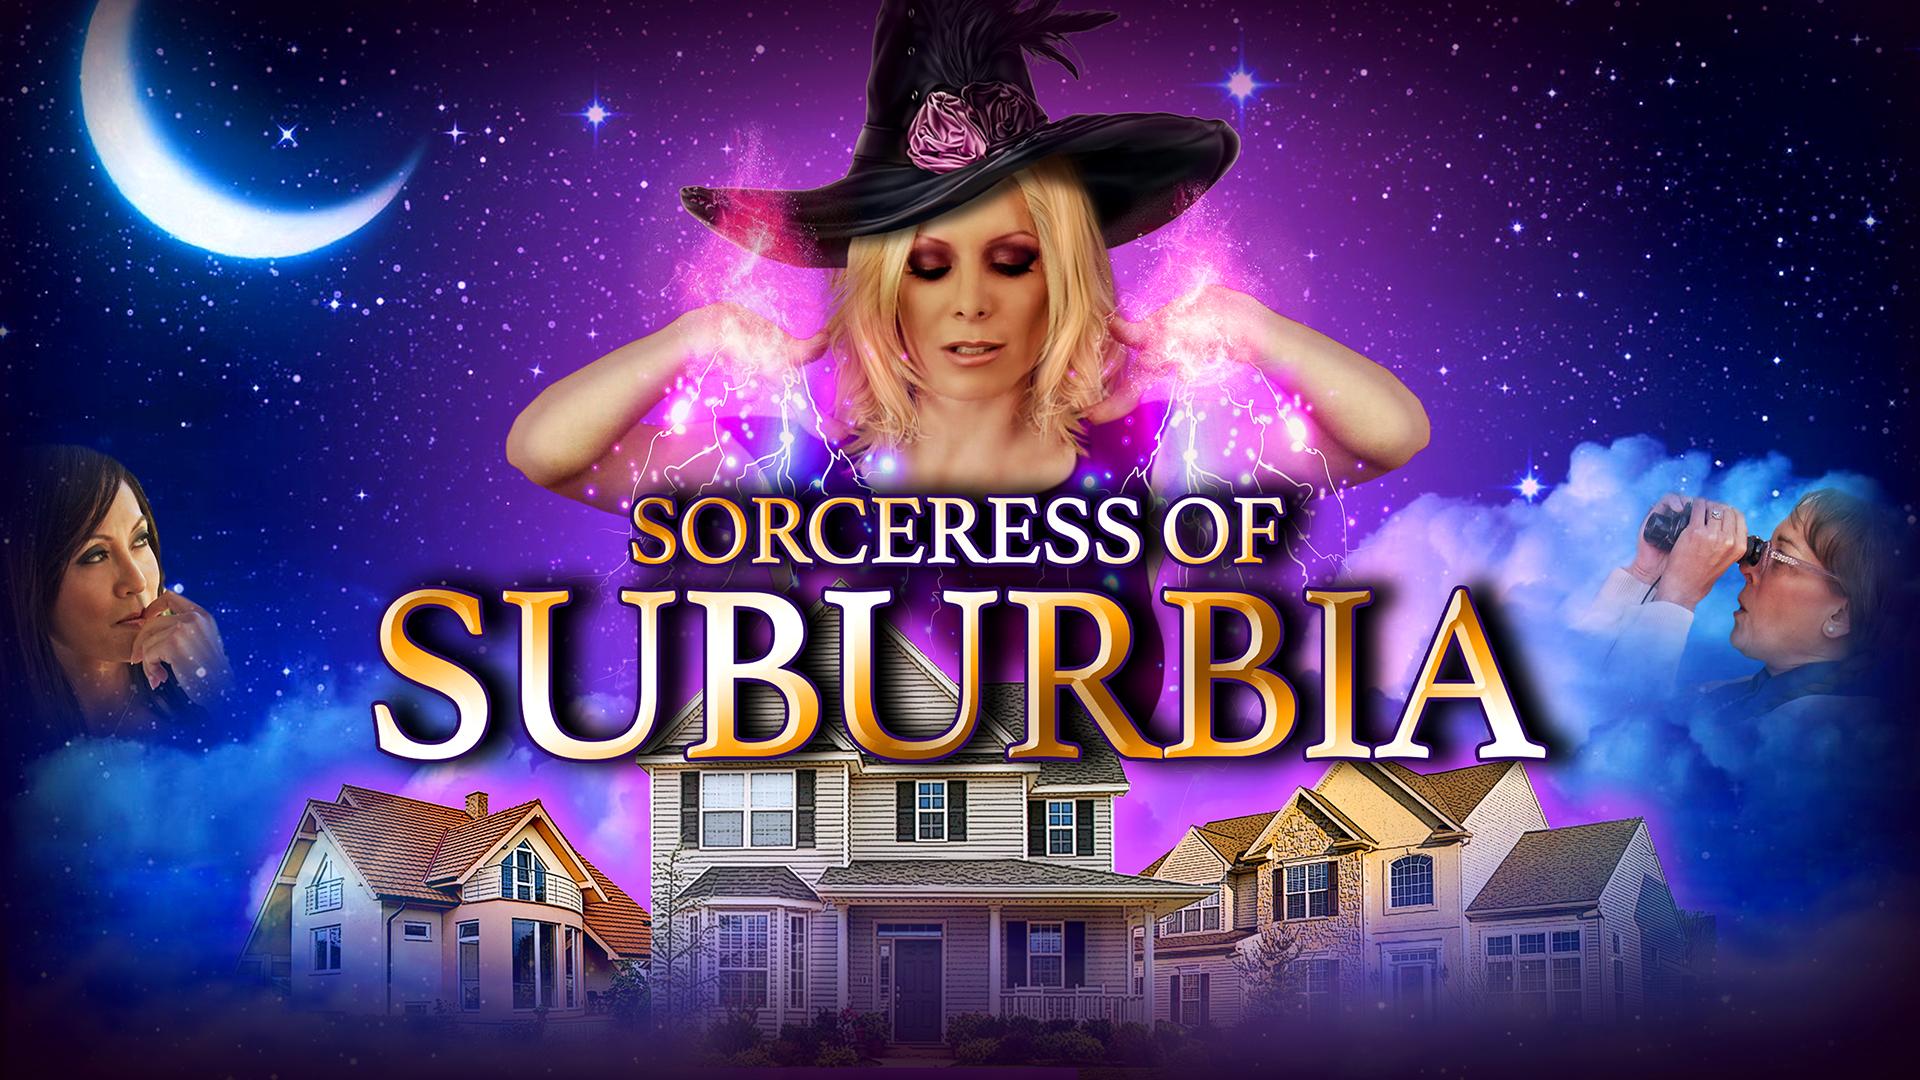 Sorceress of Suburbia